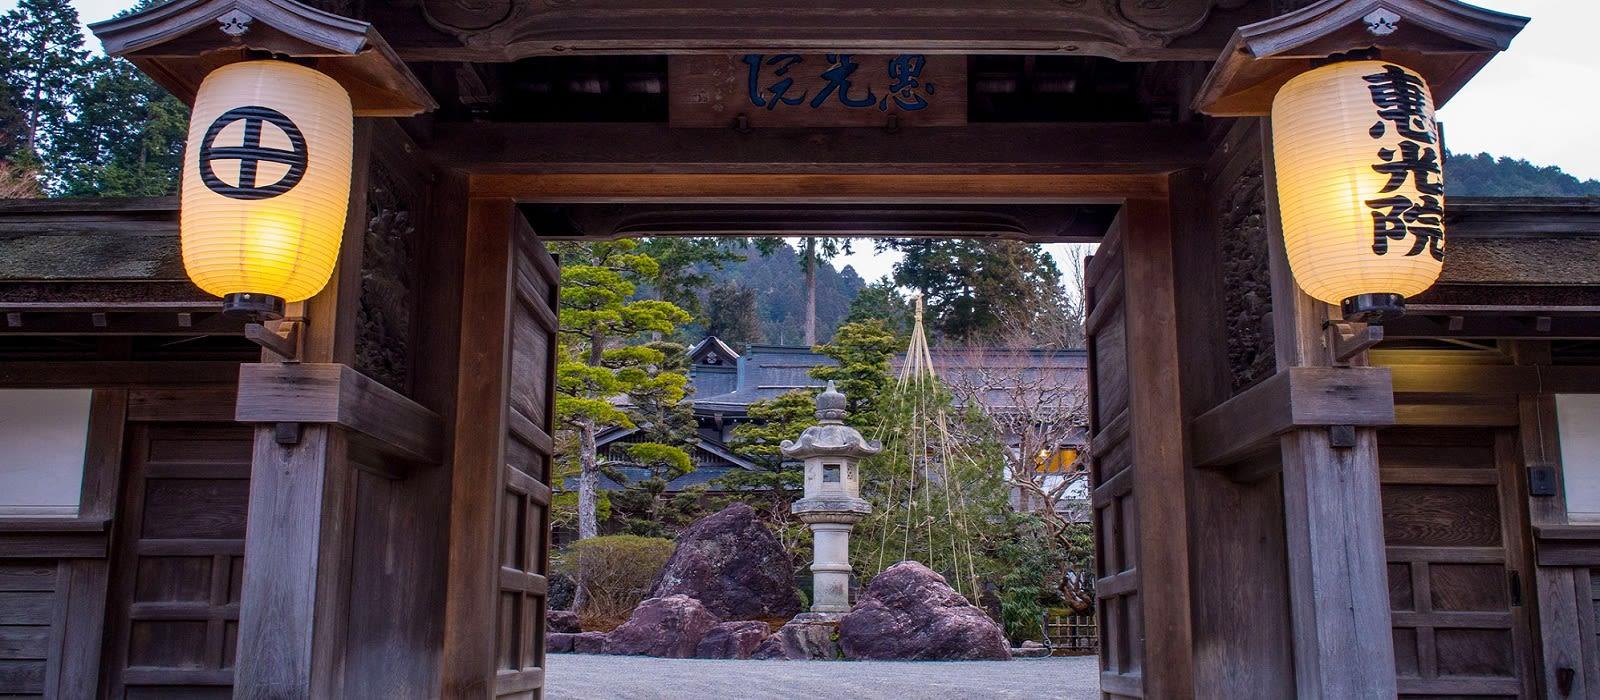 Hotel Buddhist Temple Lodging Japan